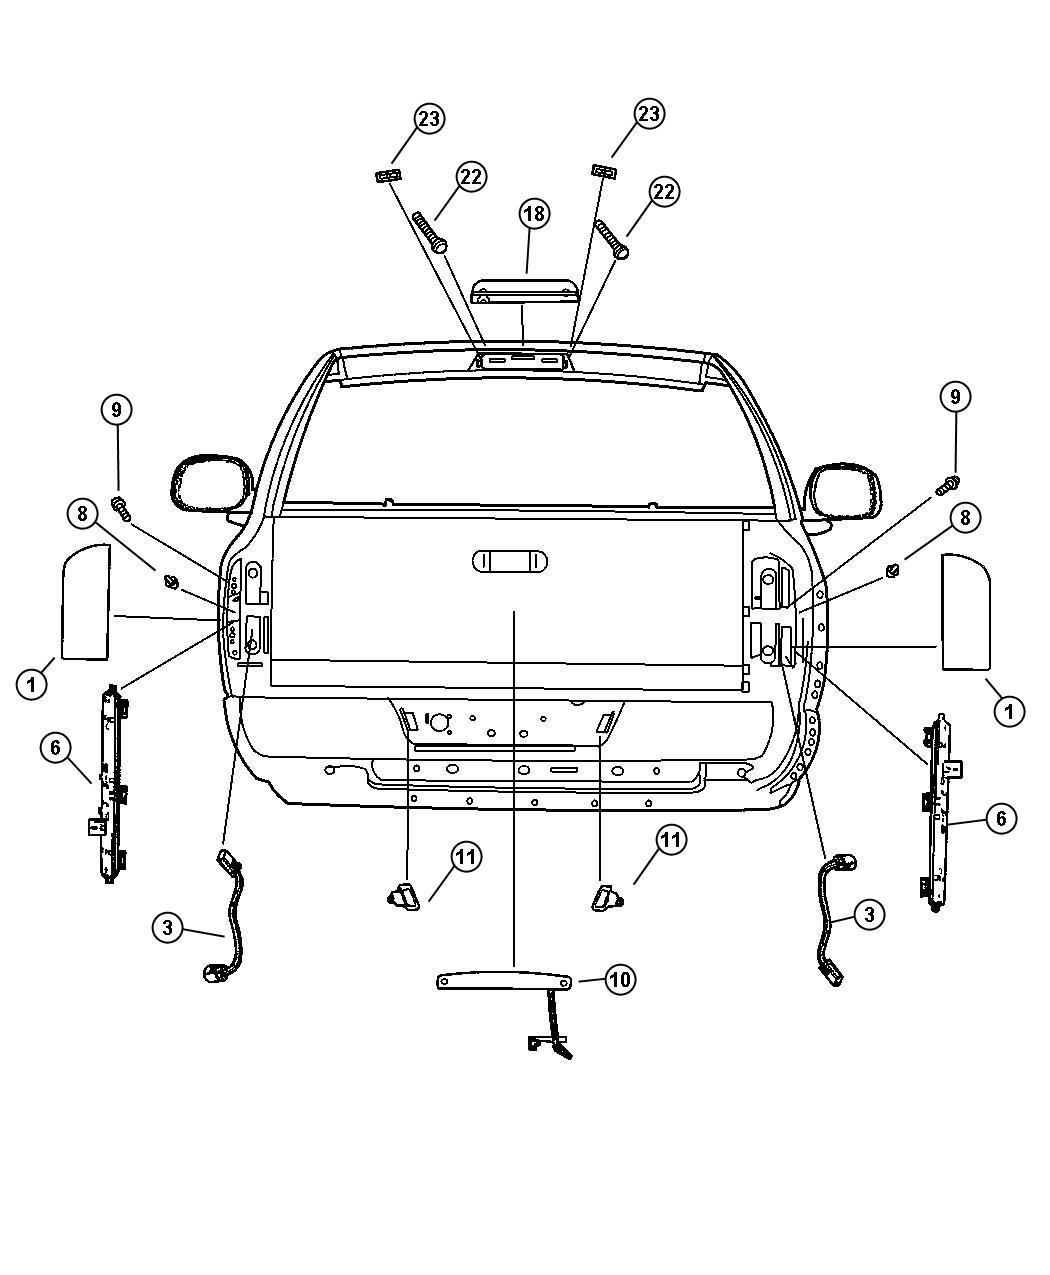 Dodge Ram Slt Quad Cab 4 7l Magnum V8 A T 4x2